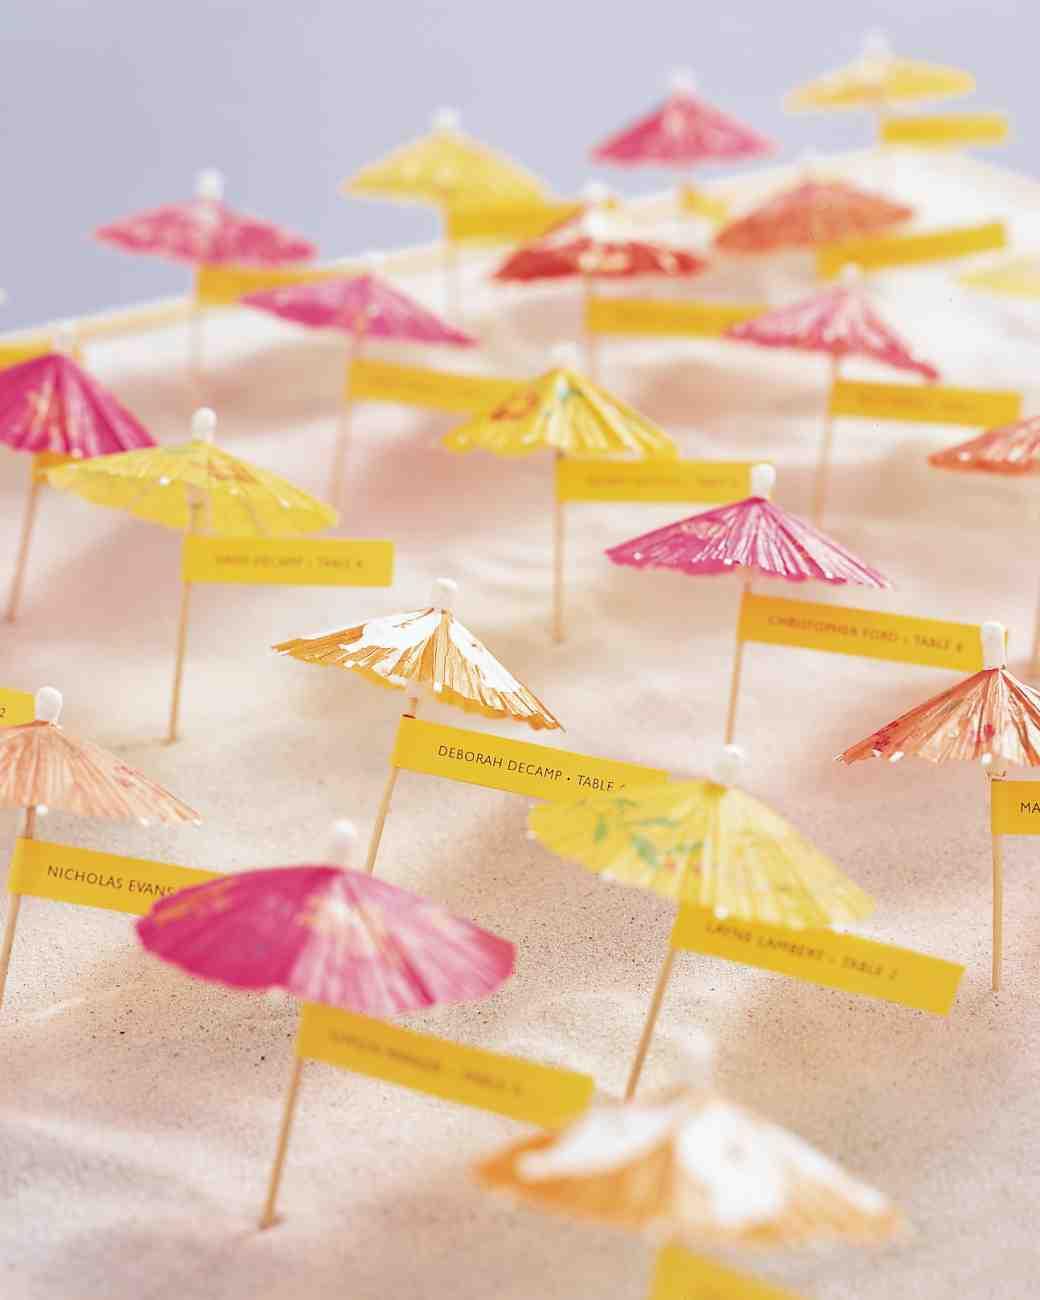 20 Wonderful Escort and Place Card Ideas for a Beach Wedding – Beach ...